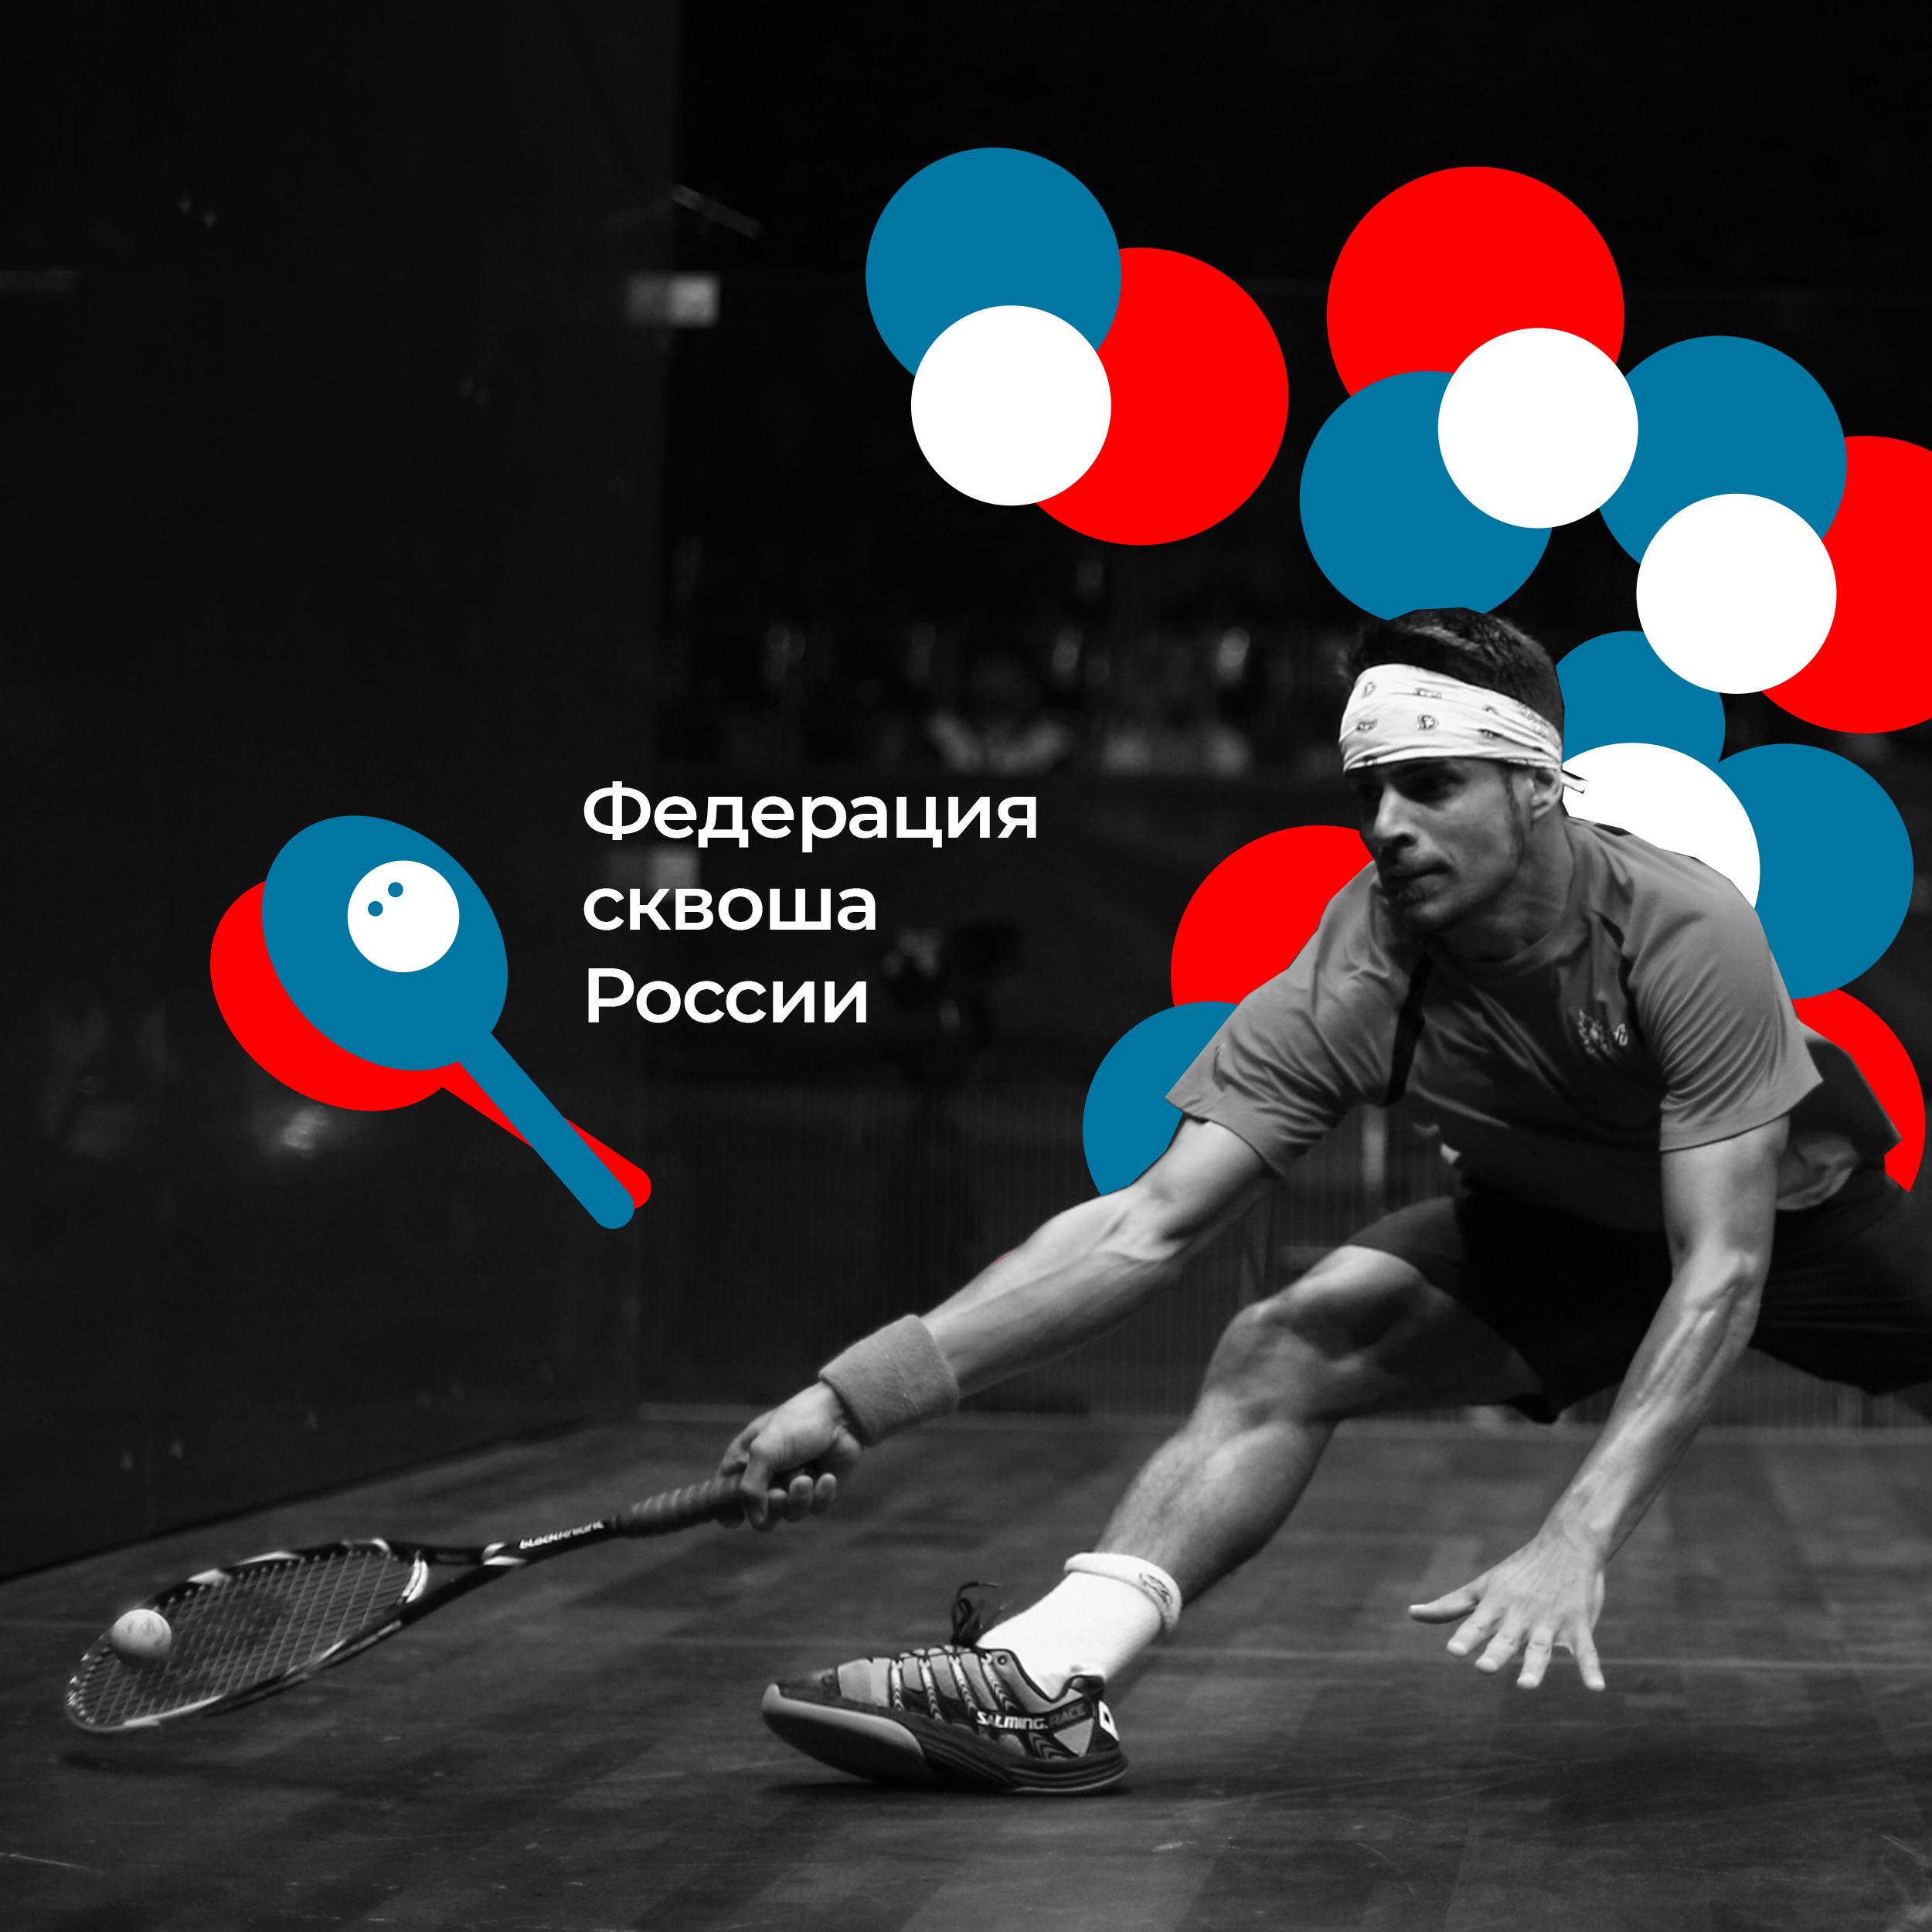 Разработать логотип для Федерации сквоша России фото f_7795f32b2fd3bb17.jpg